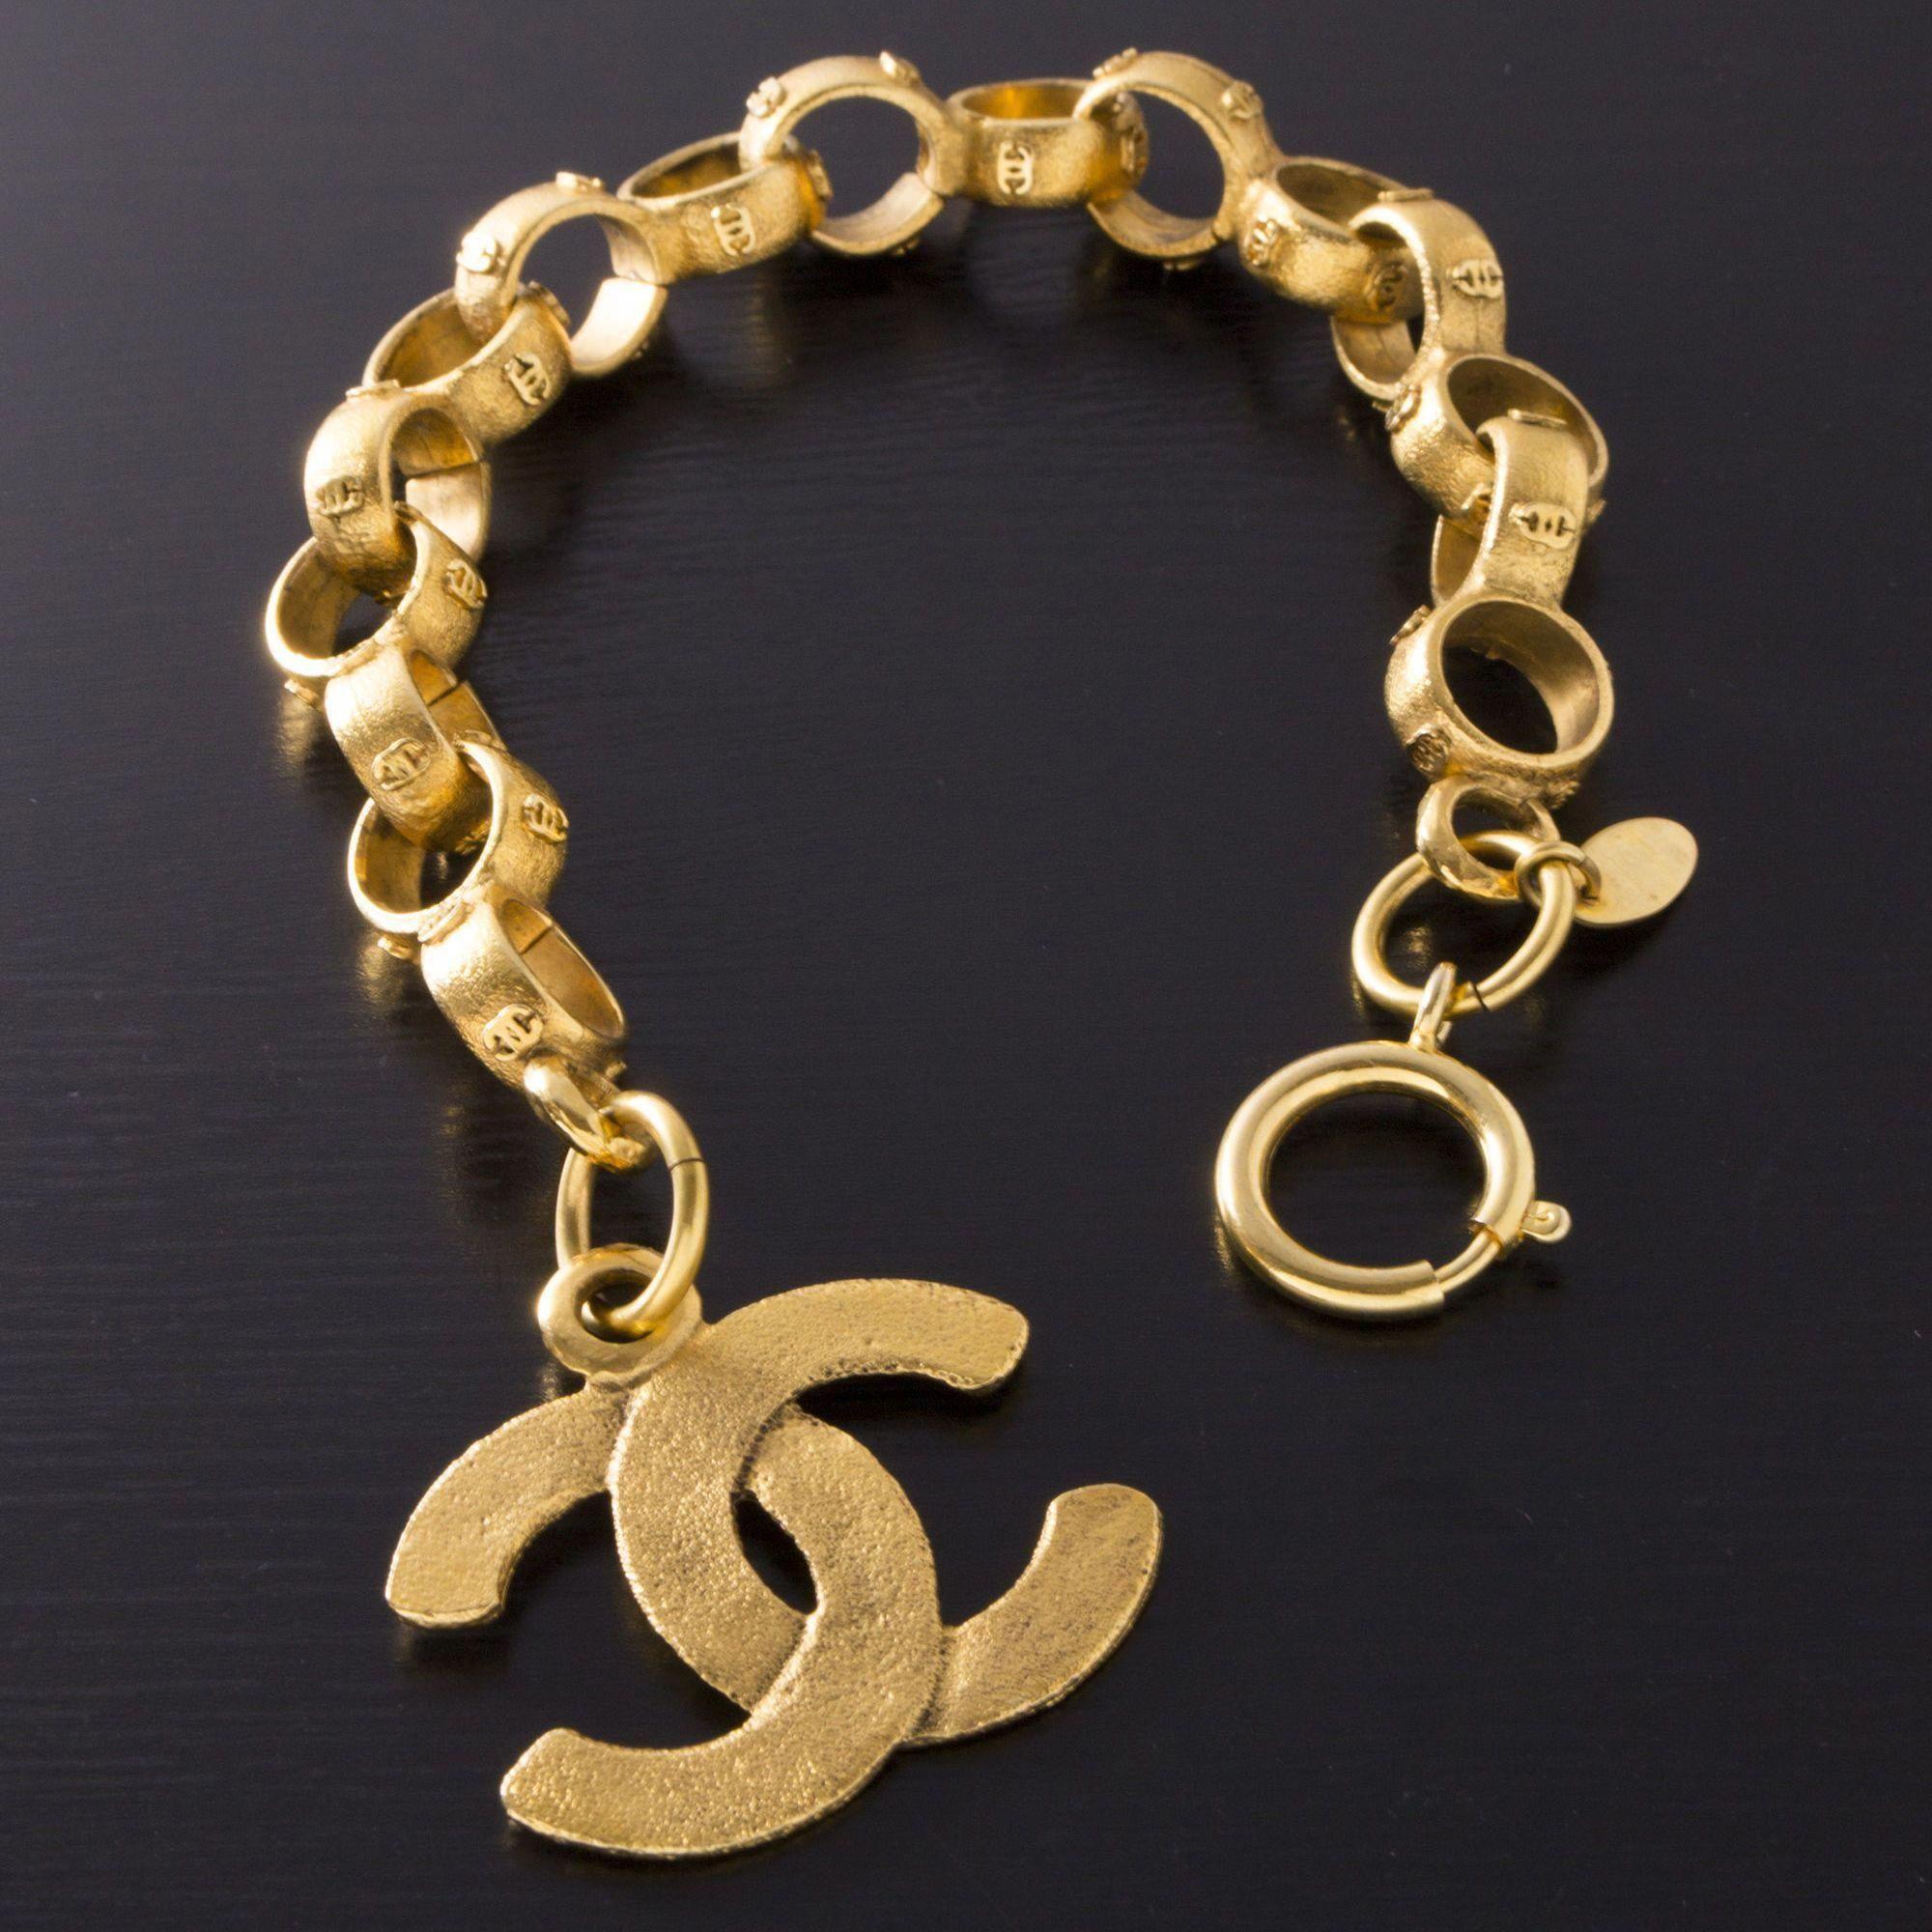 Sterling Silver Jewelry For Women  RoyalJewelry  481e3ce6f4